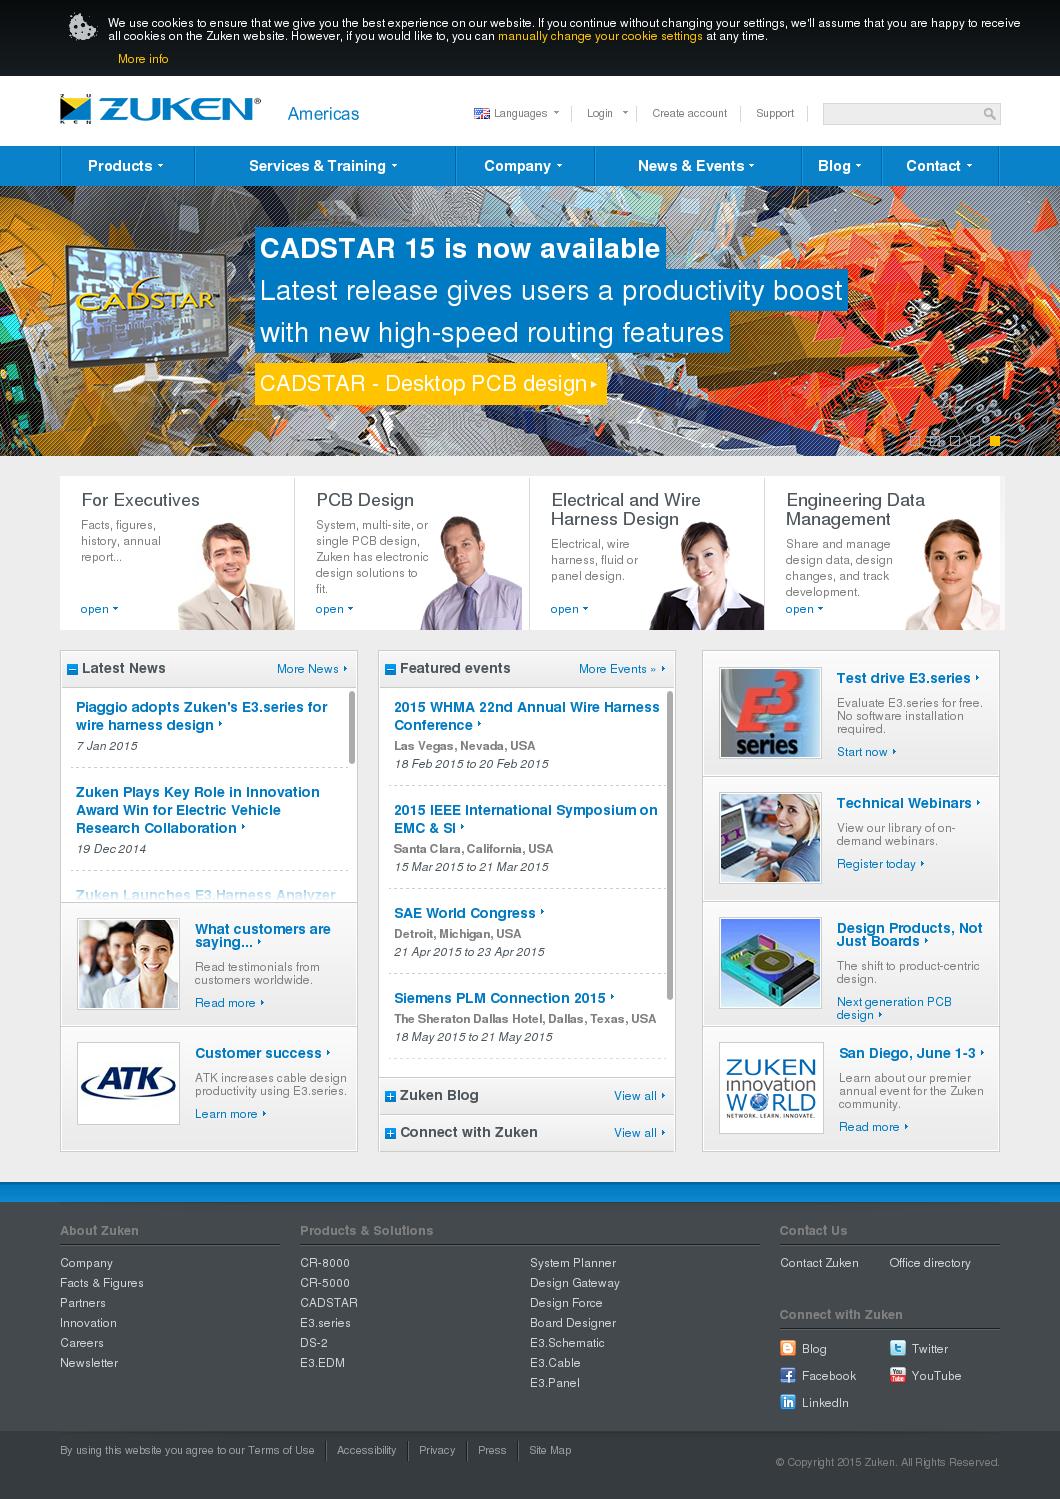 Zuken Competitors, Revenue and Employees - Owler Company Profile